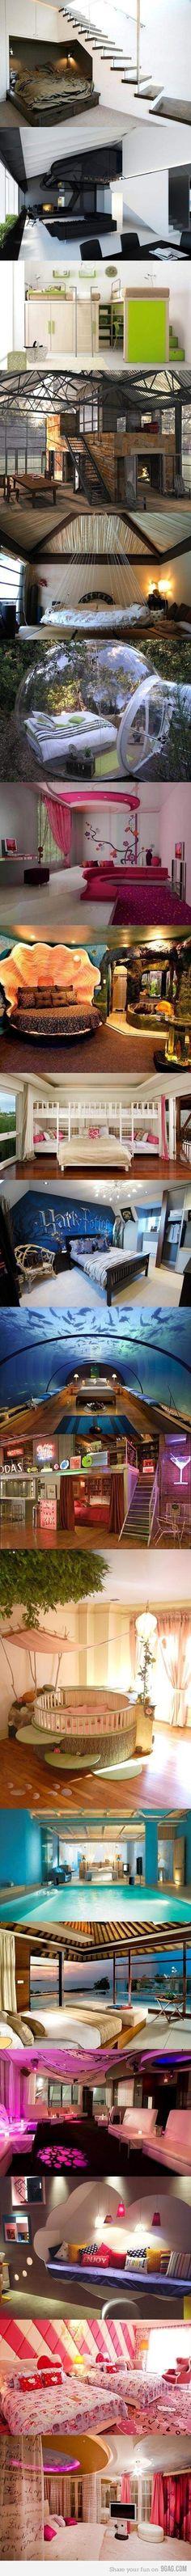 Dream Bedrooms. Dream Bedrooms. Dream Bedrooms.